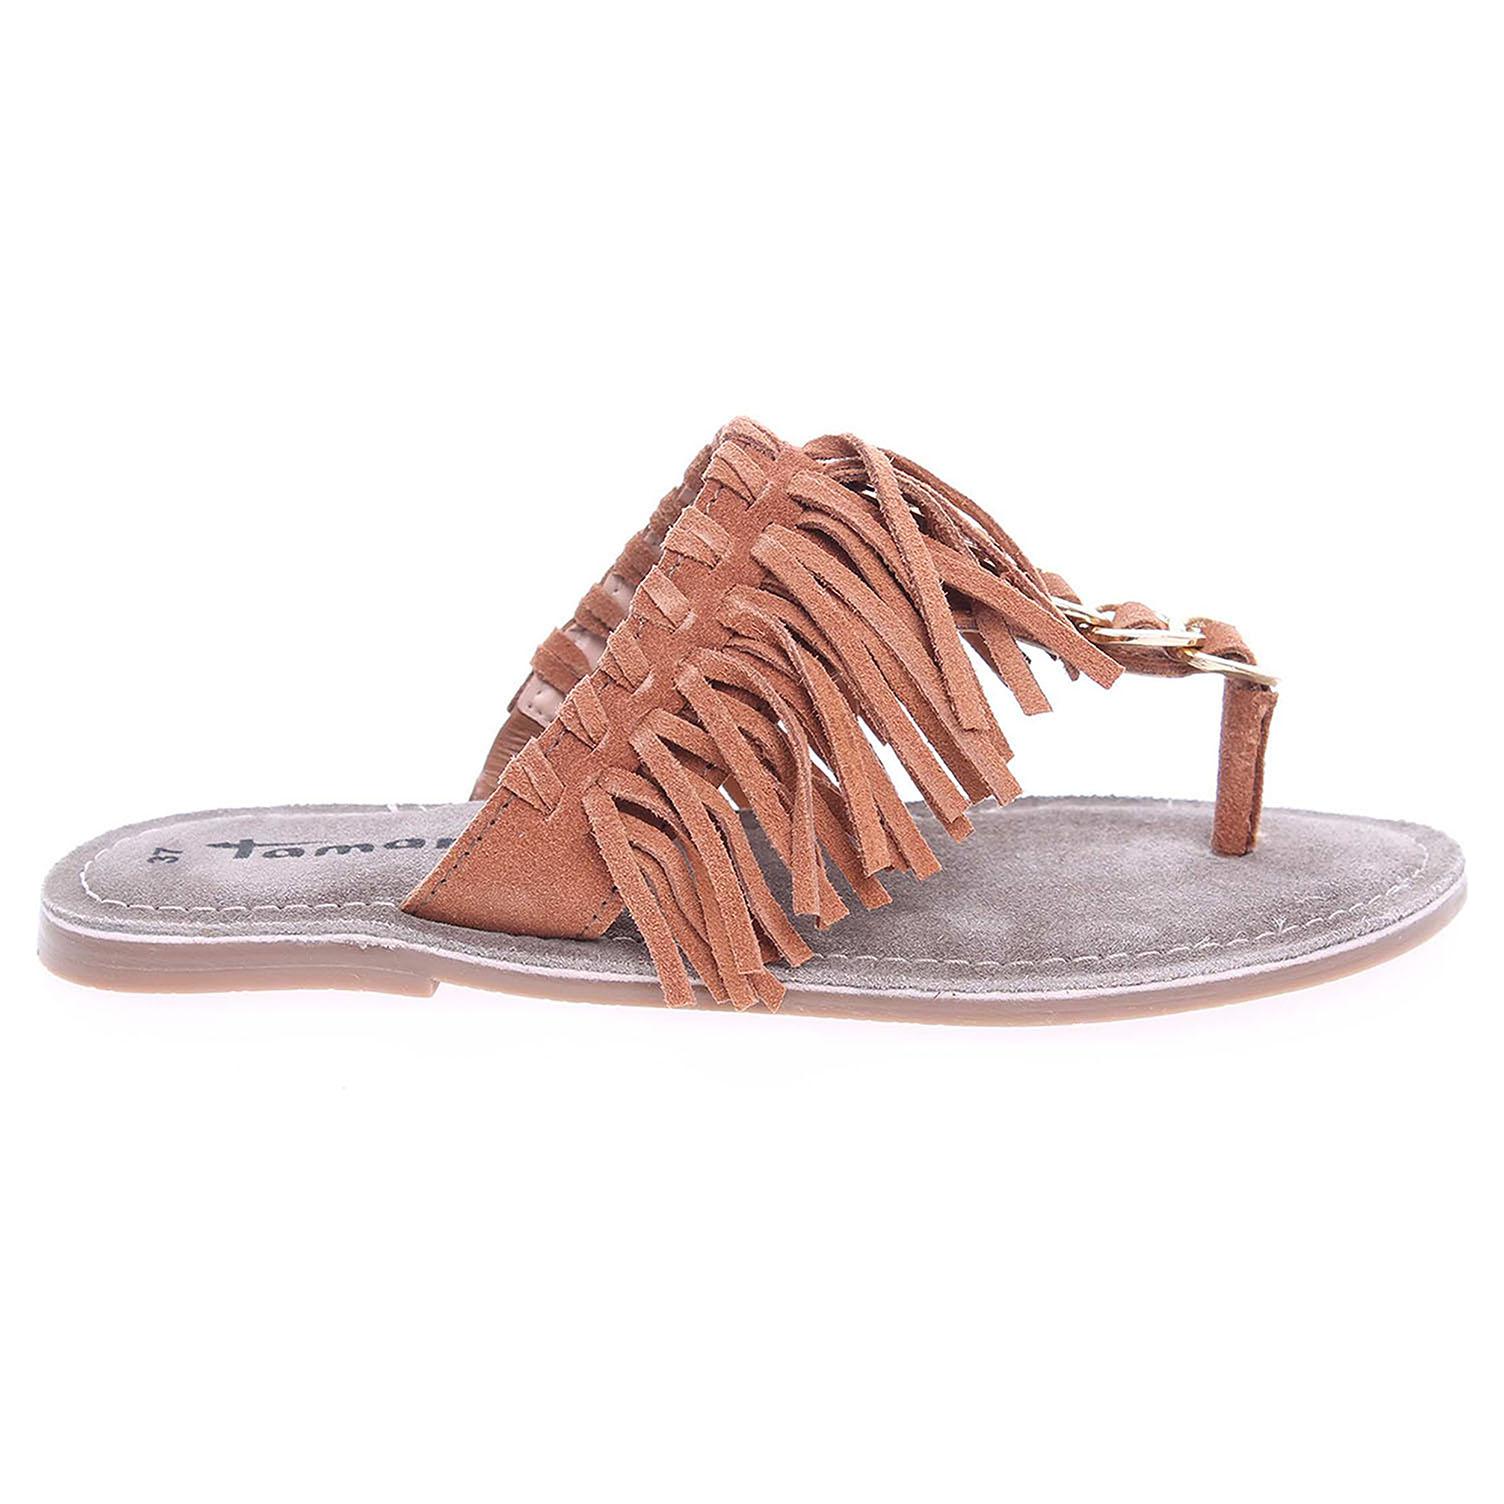 Ecco Tamaris dámské pantofle 1-27136-36 hnědé 23600736